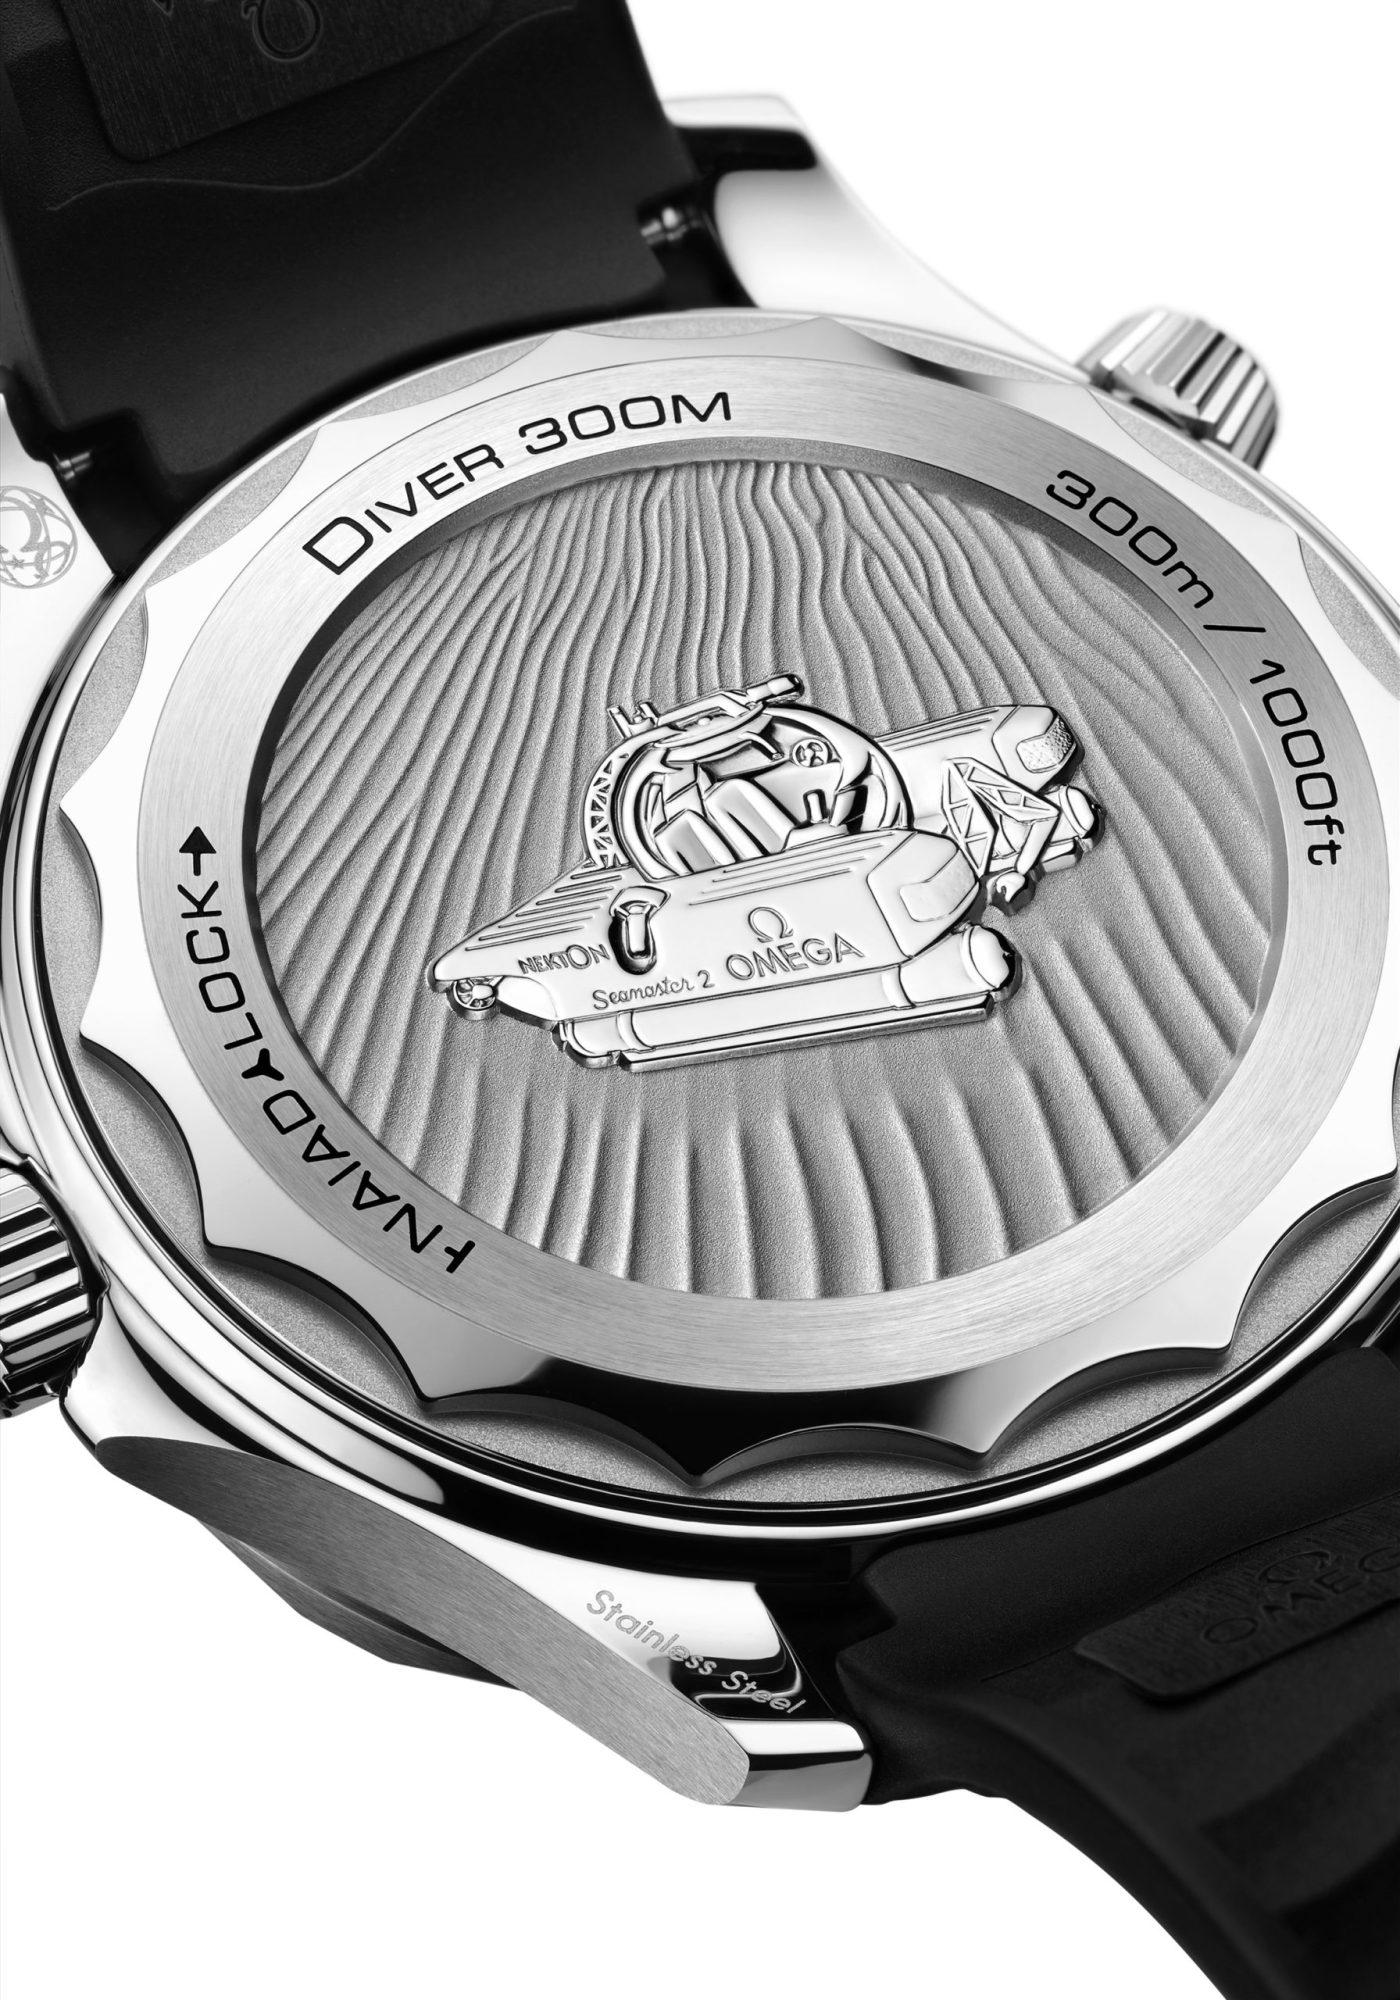 Omega Seamaster Diver 300M Nekton Edition caseback